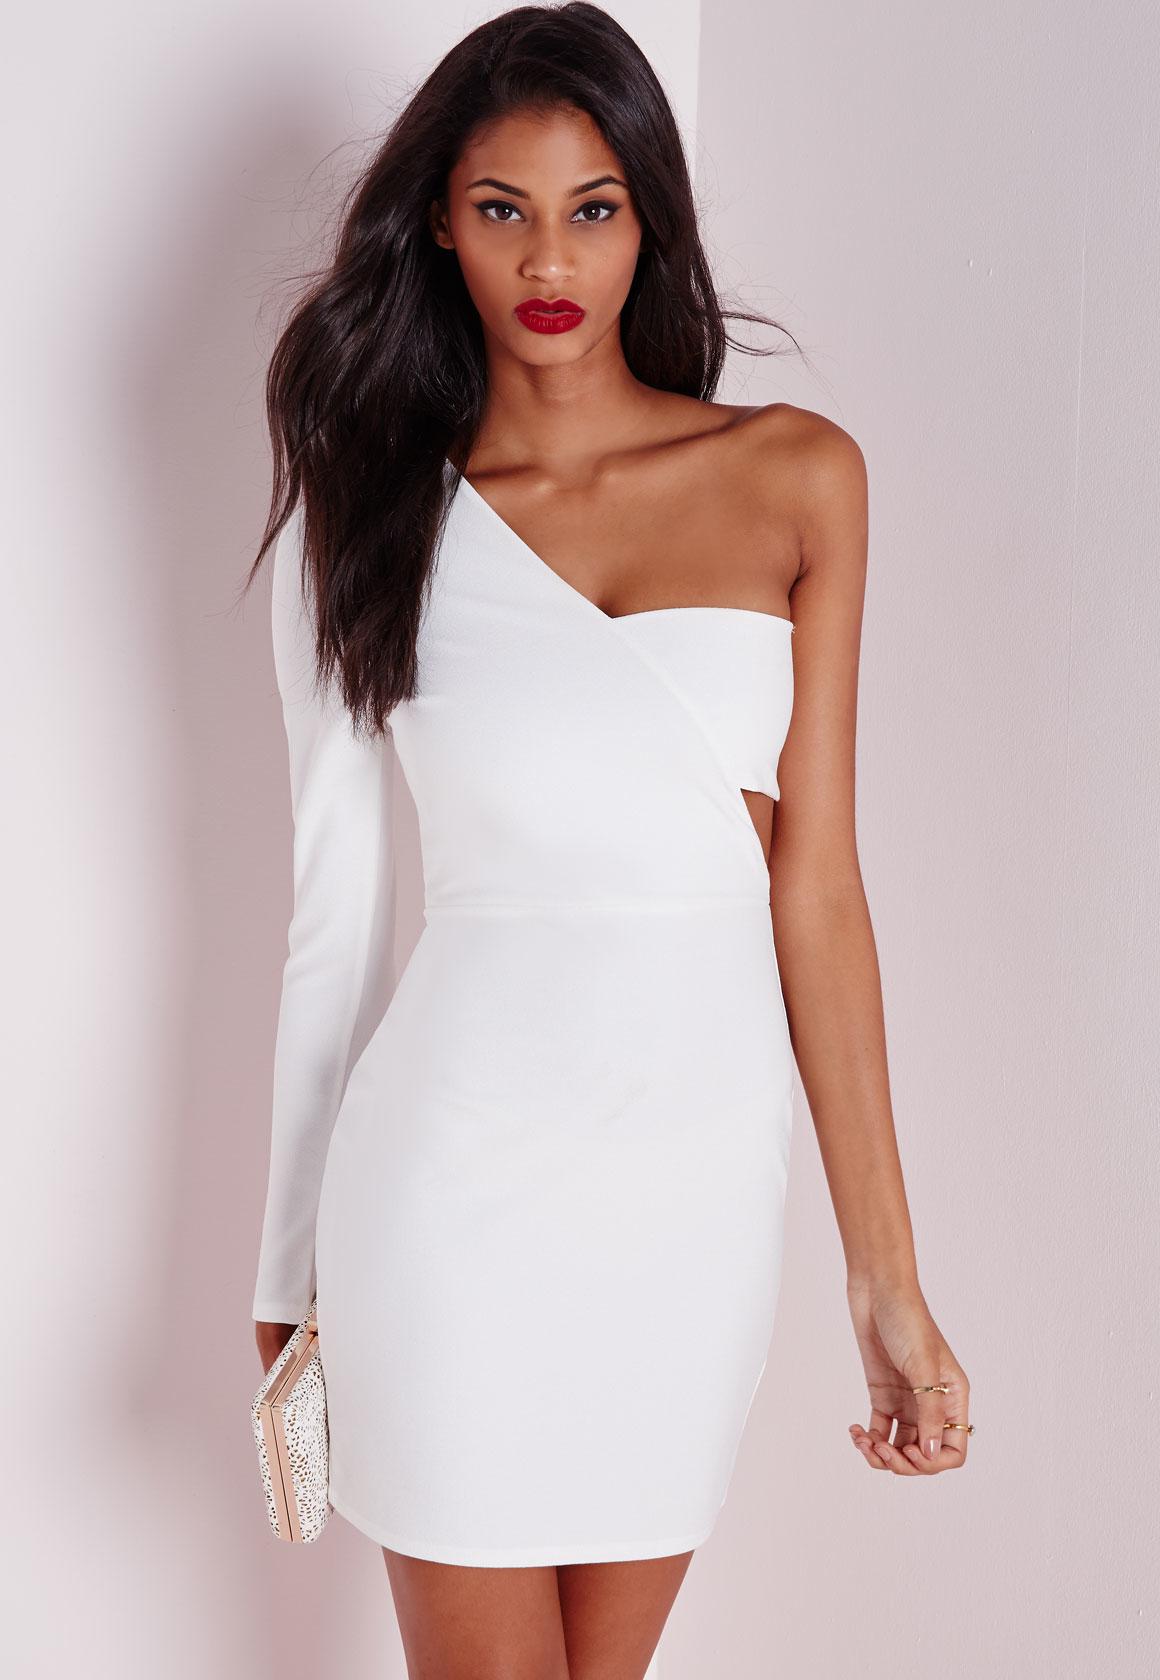 Boohoo white bodycon dress one shoulder labor day sale